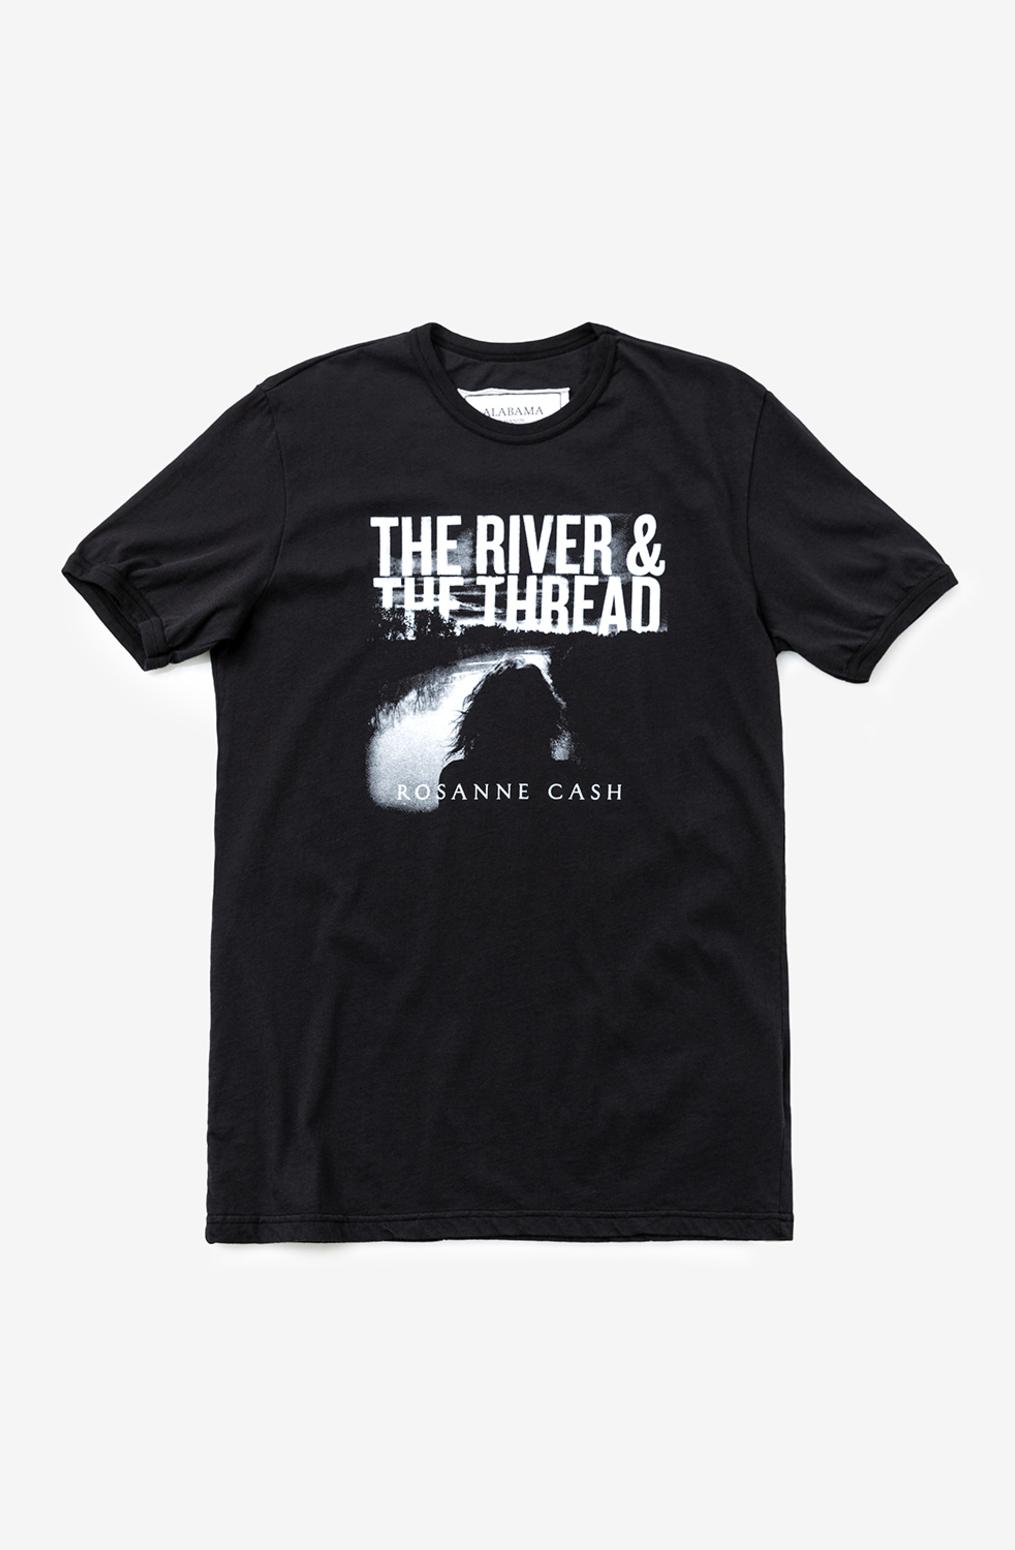 Alabama chanin rosanne cash the river and the thread t shirt